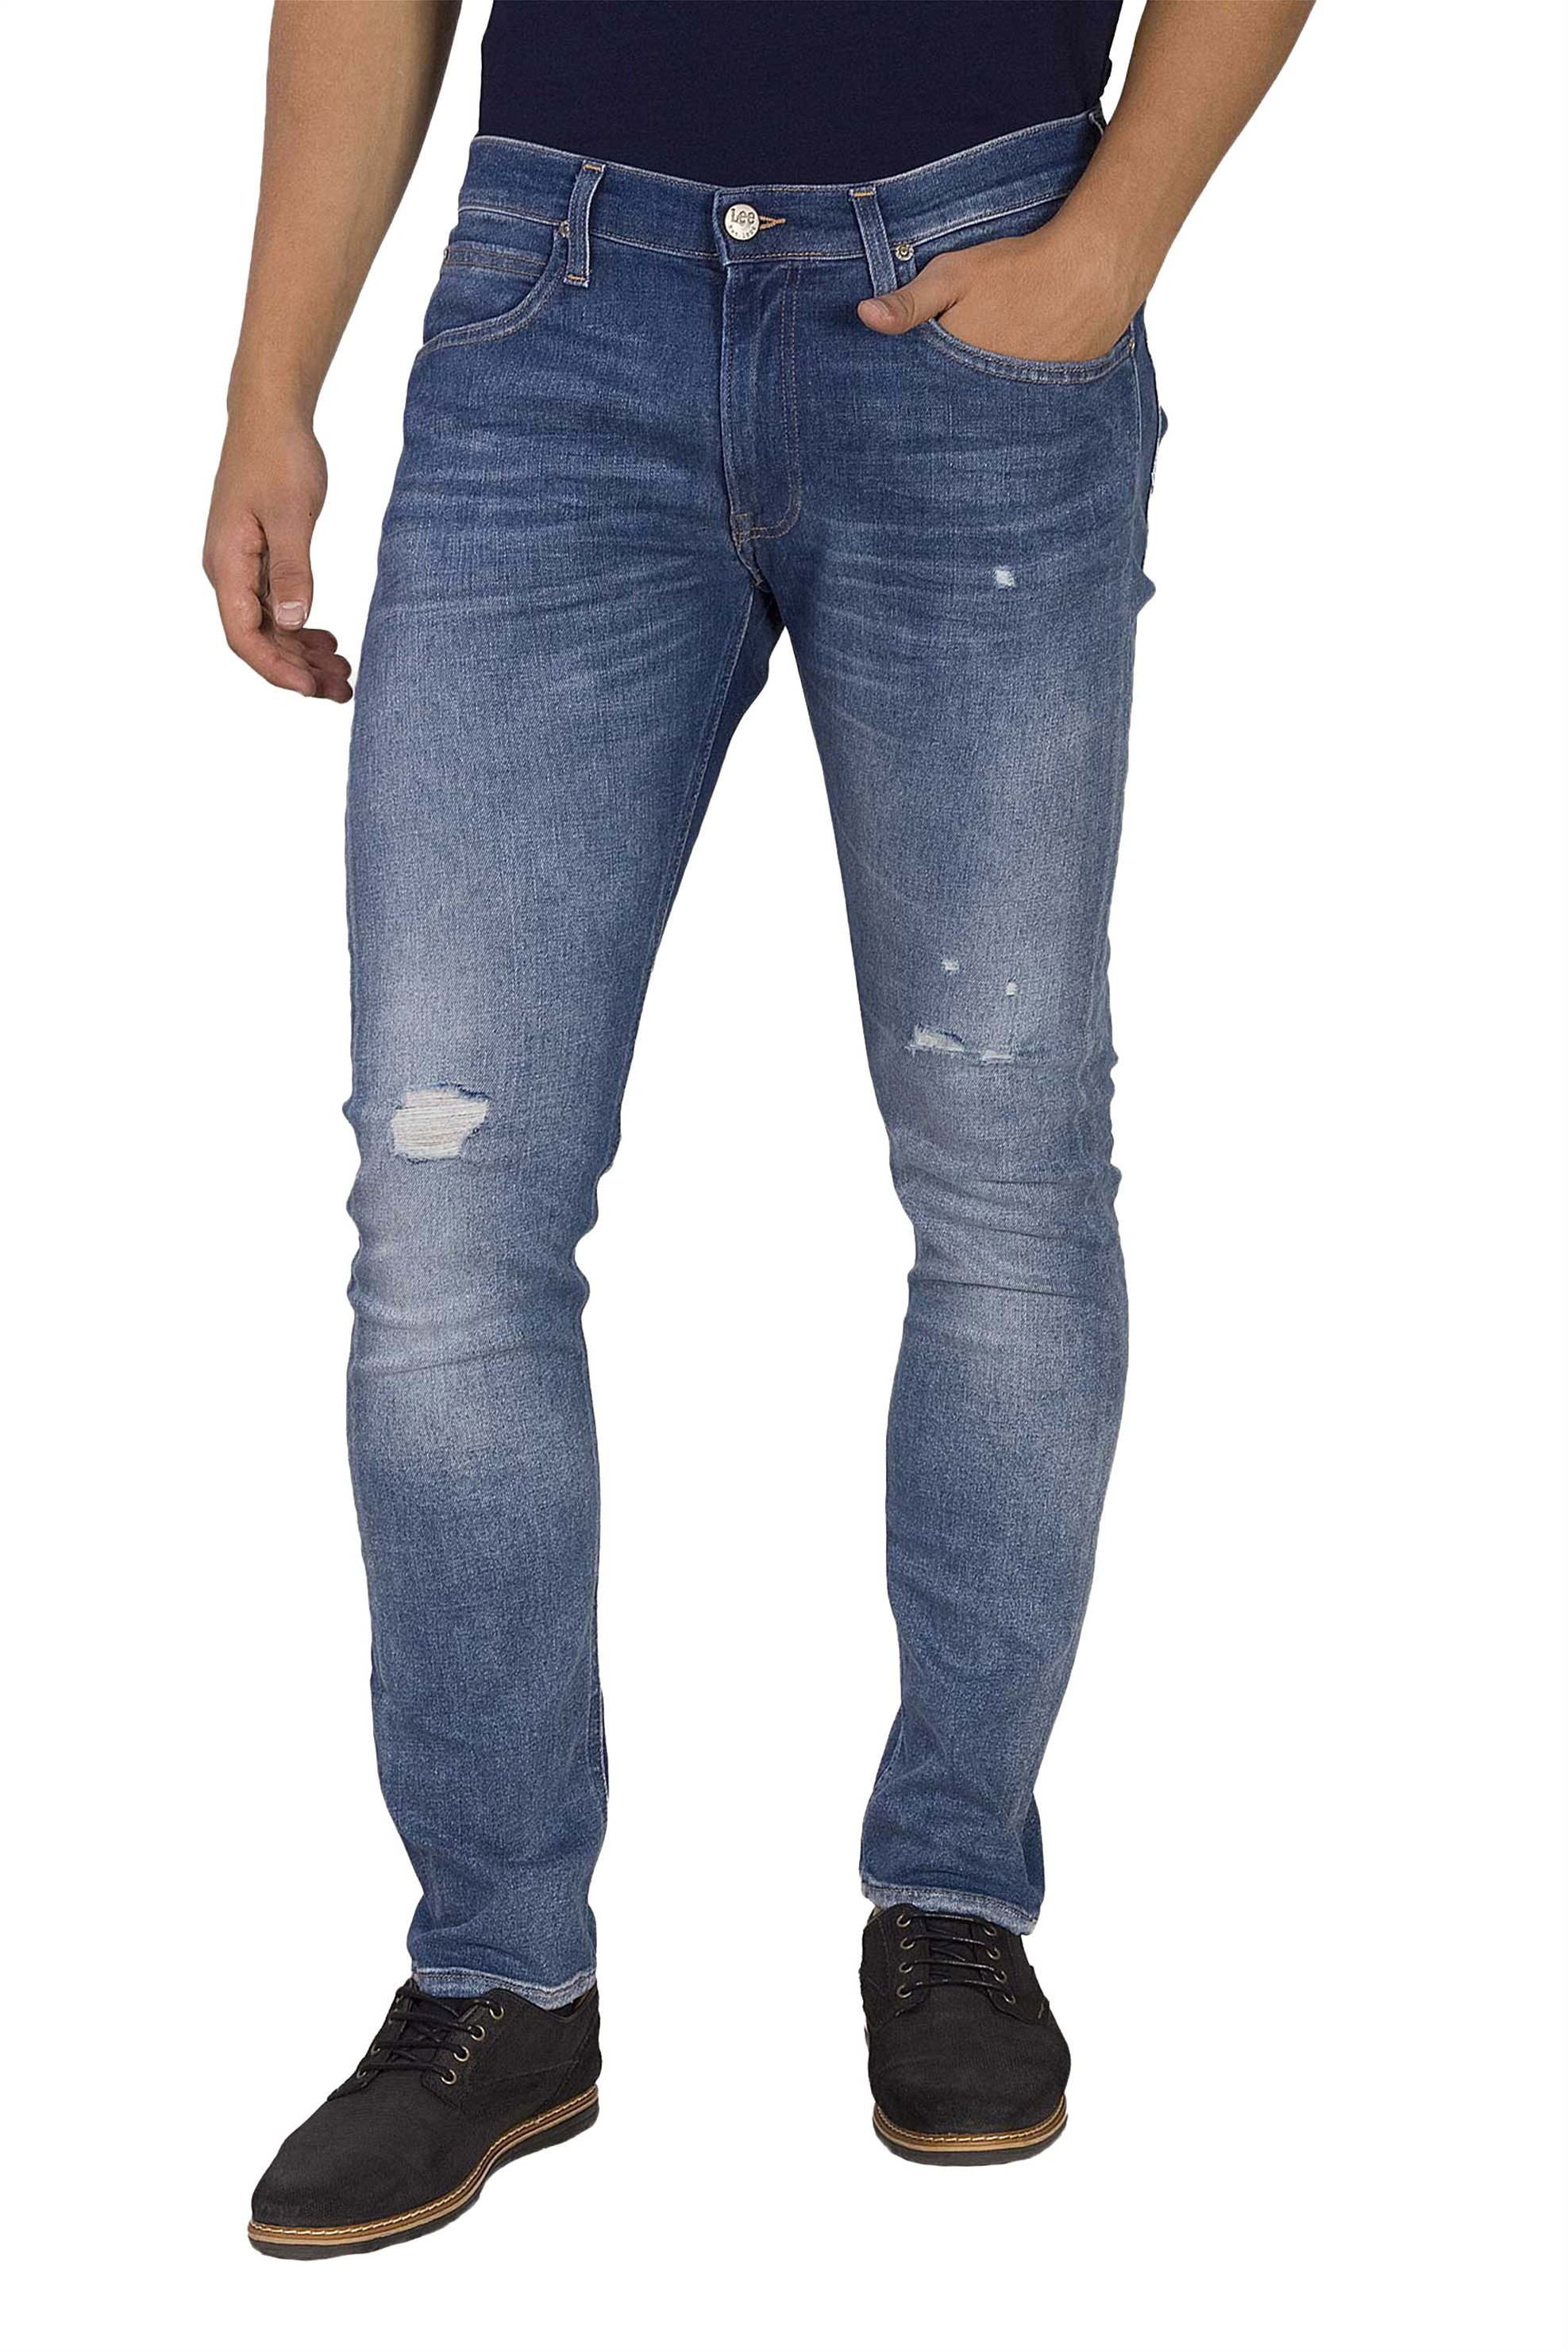 Lee Luke slim tapered ανδρικό τζην παντελόνι Broken Blue - L719RONK - Μπλε ανδρασ   ρουχα   jeans   slim   tapered